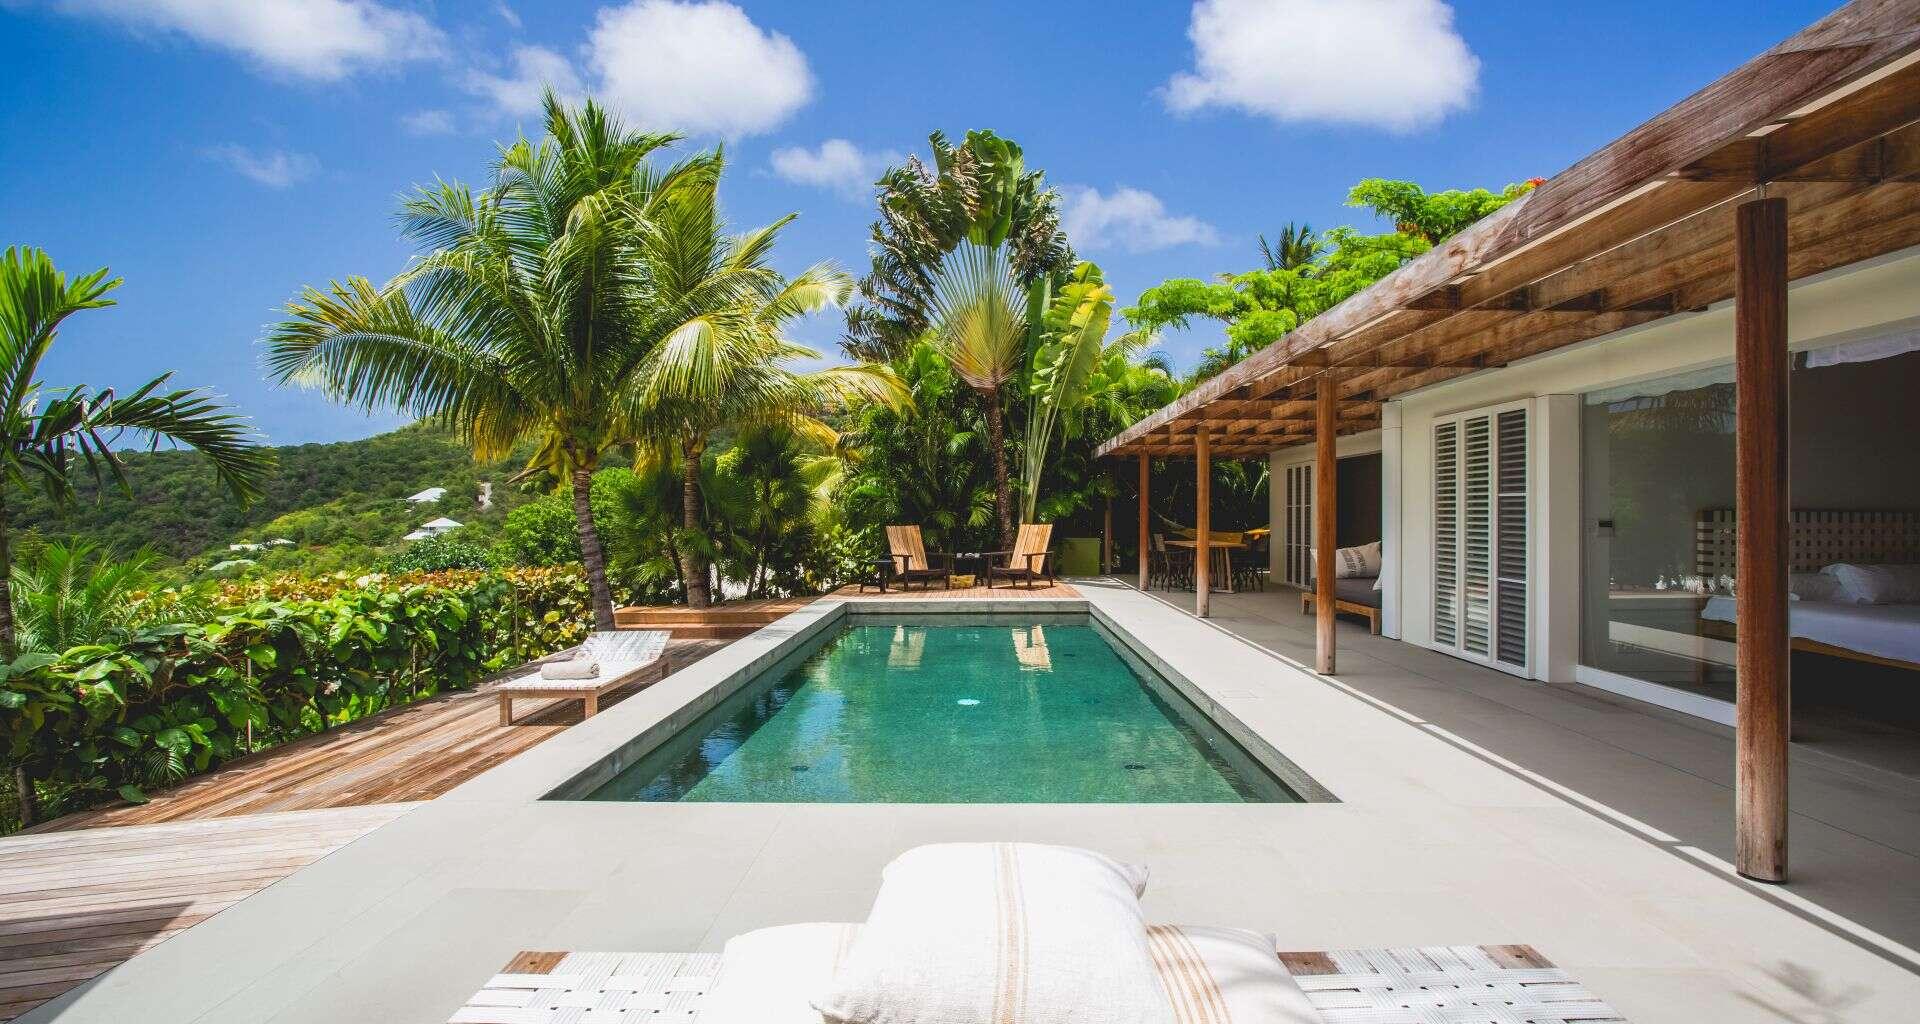 Luxury villa rentals caribbean - St barthelemy - Saint jean - No location 4 - Alaia - Image 1/13